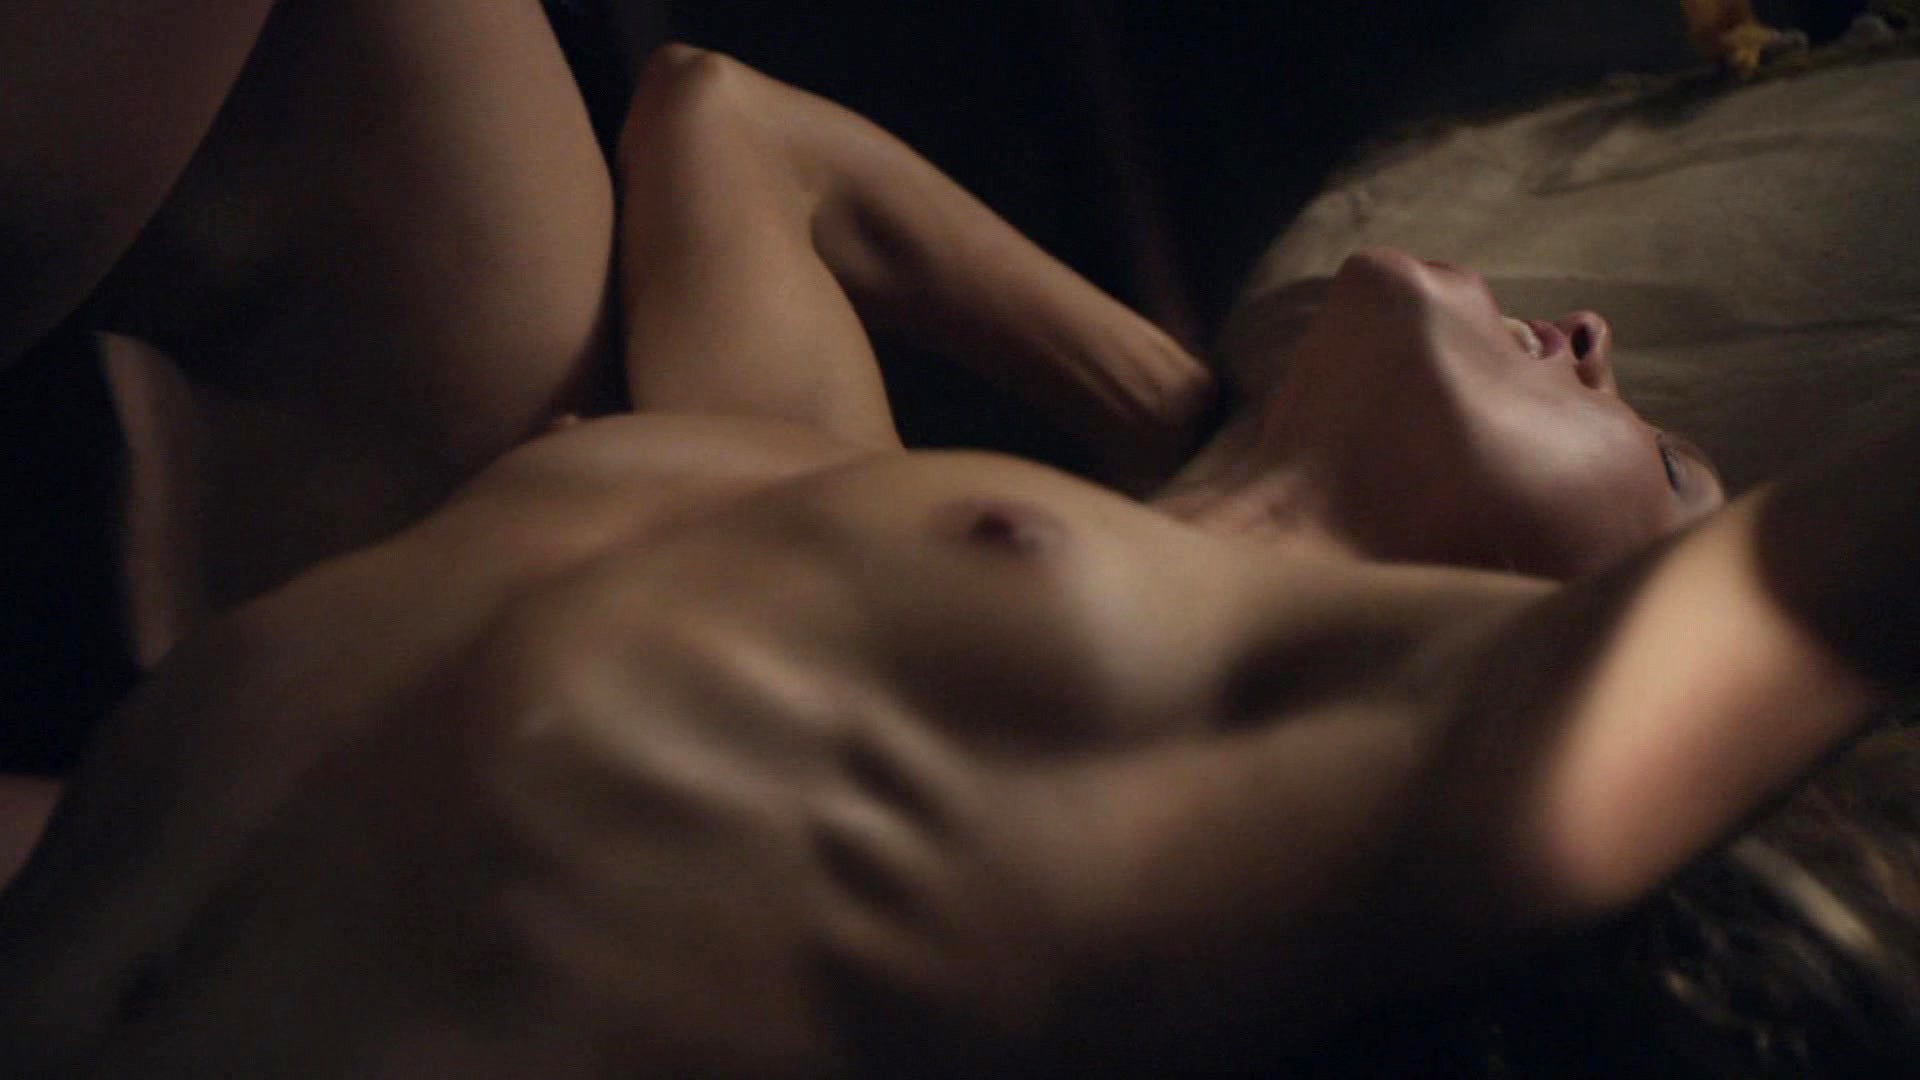 Sonya walker sex scene